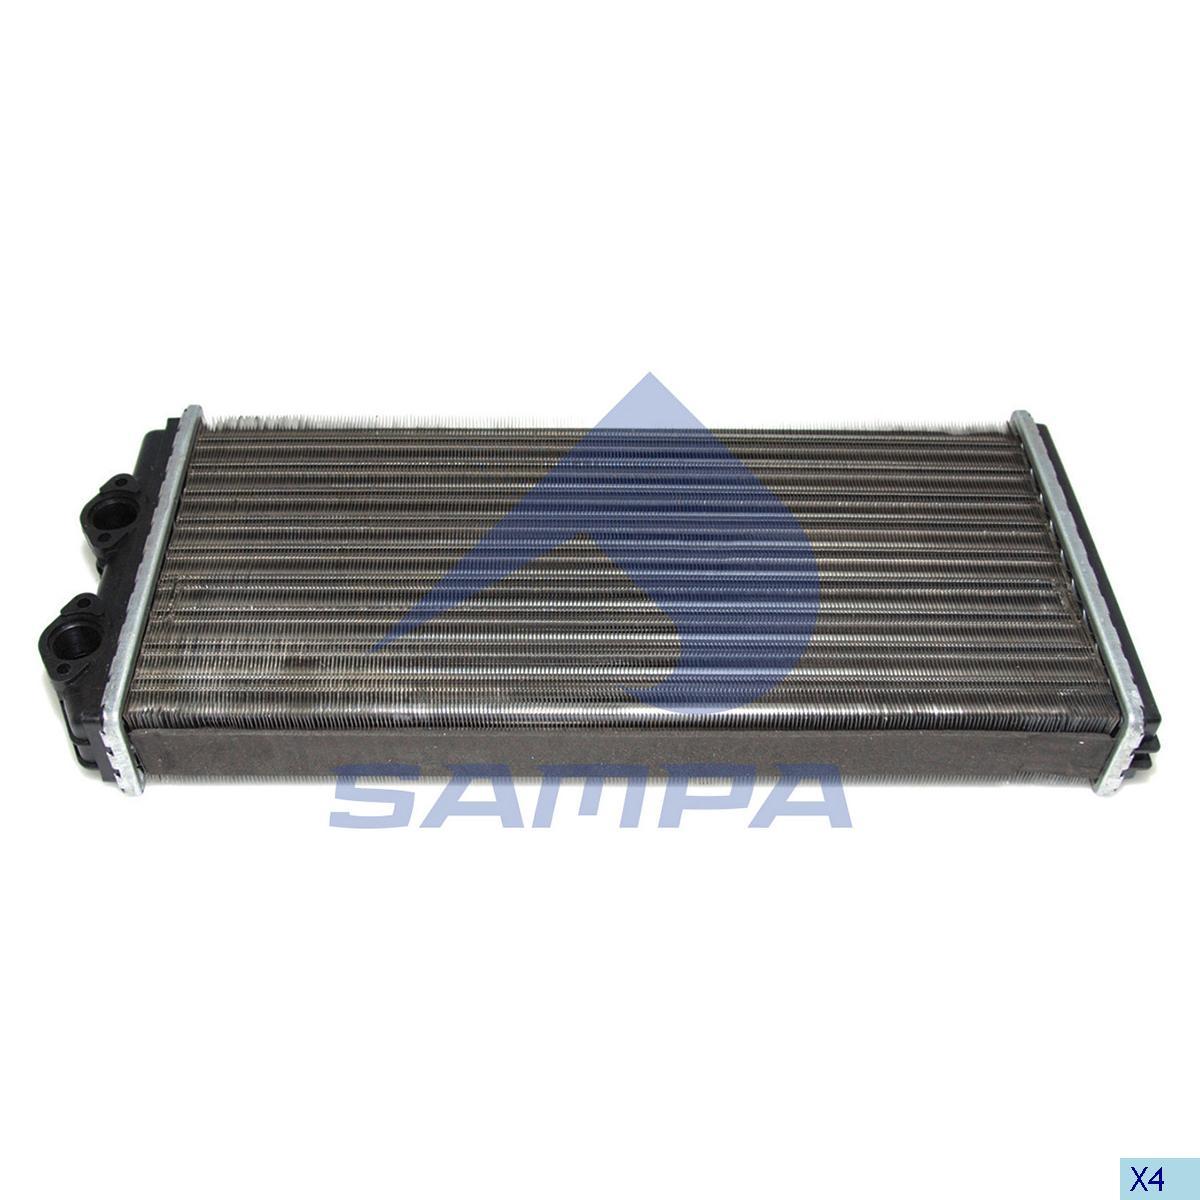 Heater Radiator, Cab Heating & Ventilation, Volvo, Cab